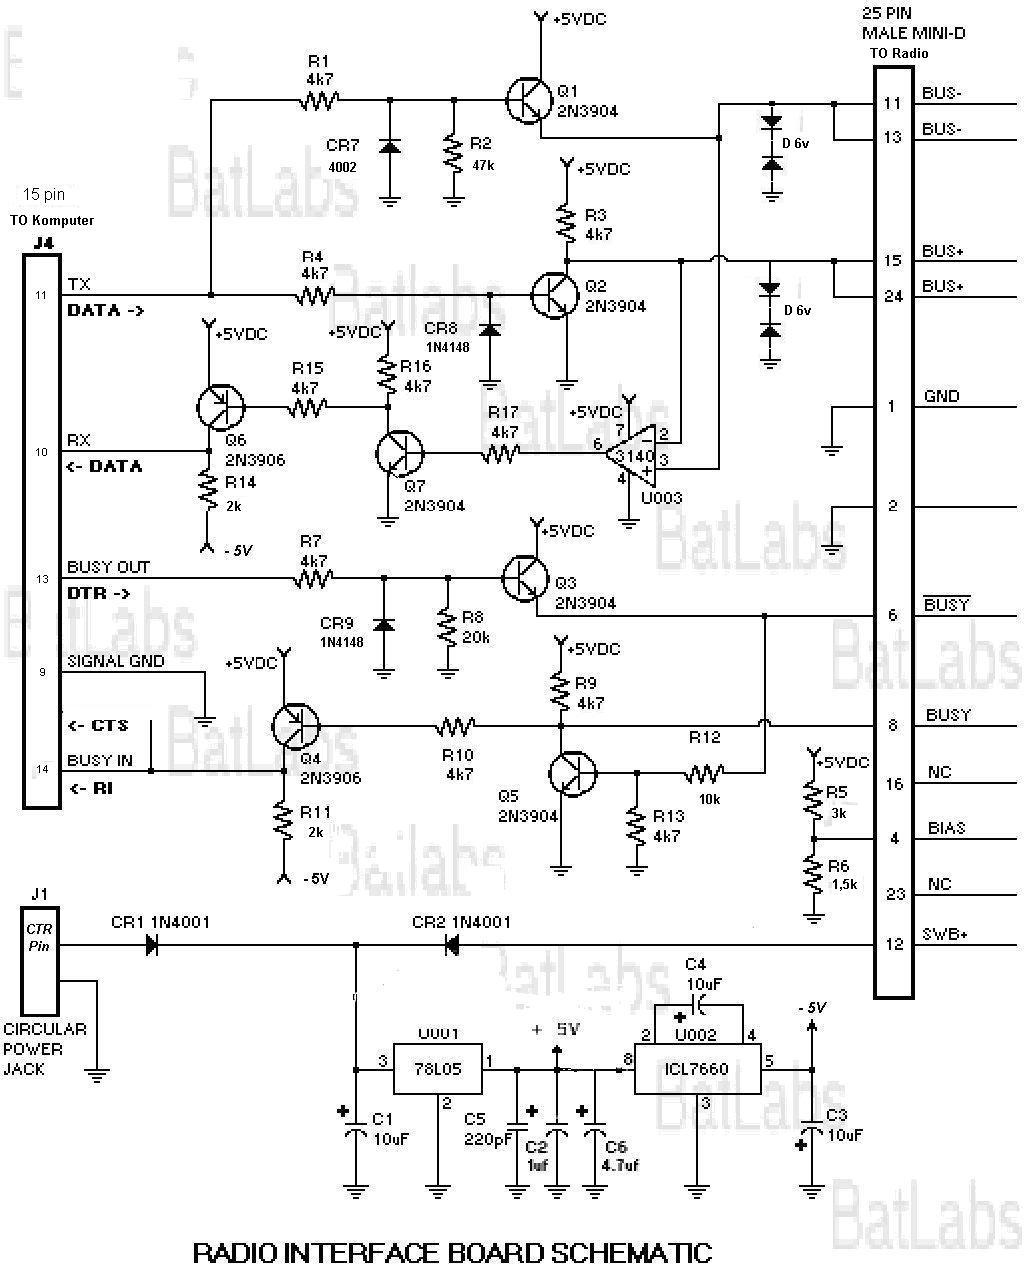 Solucionado Programar Magone Con Programador Original De